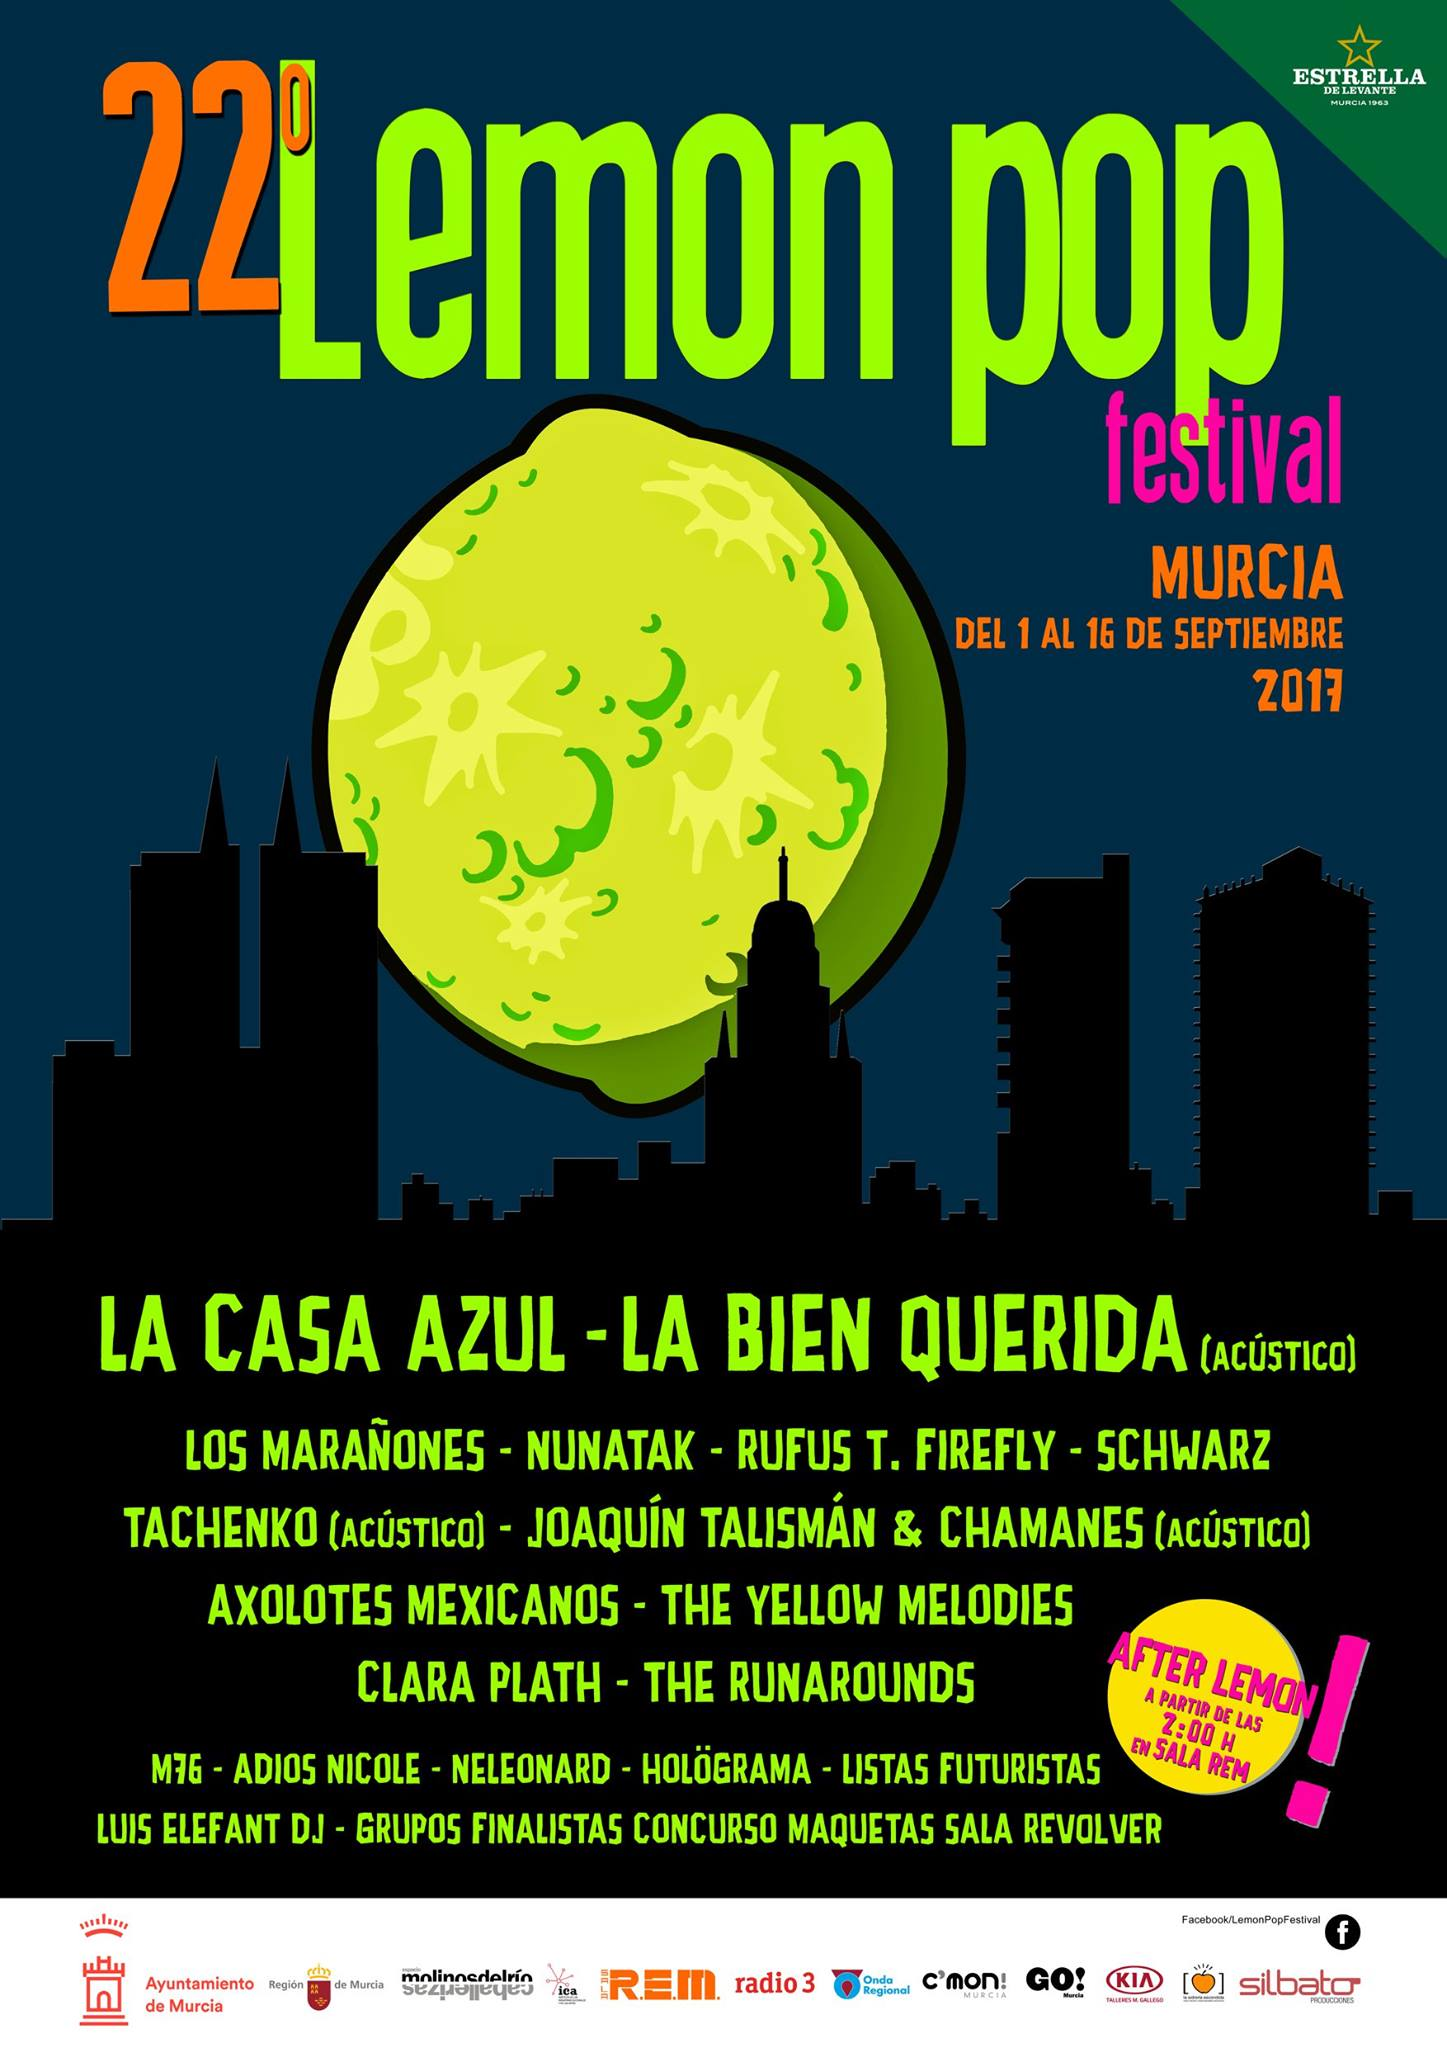 Lemon Pop 2017 del 1 al 16 de septiembre 🍋🎸🎶